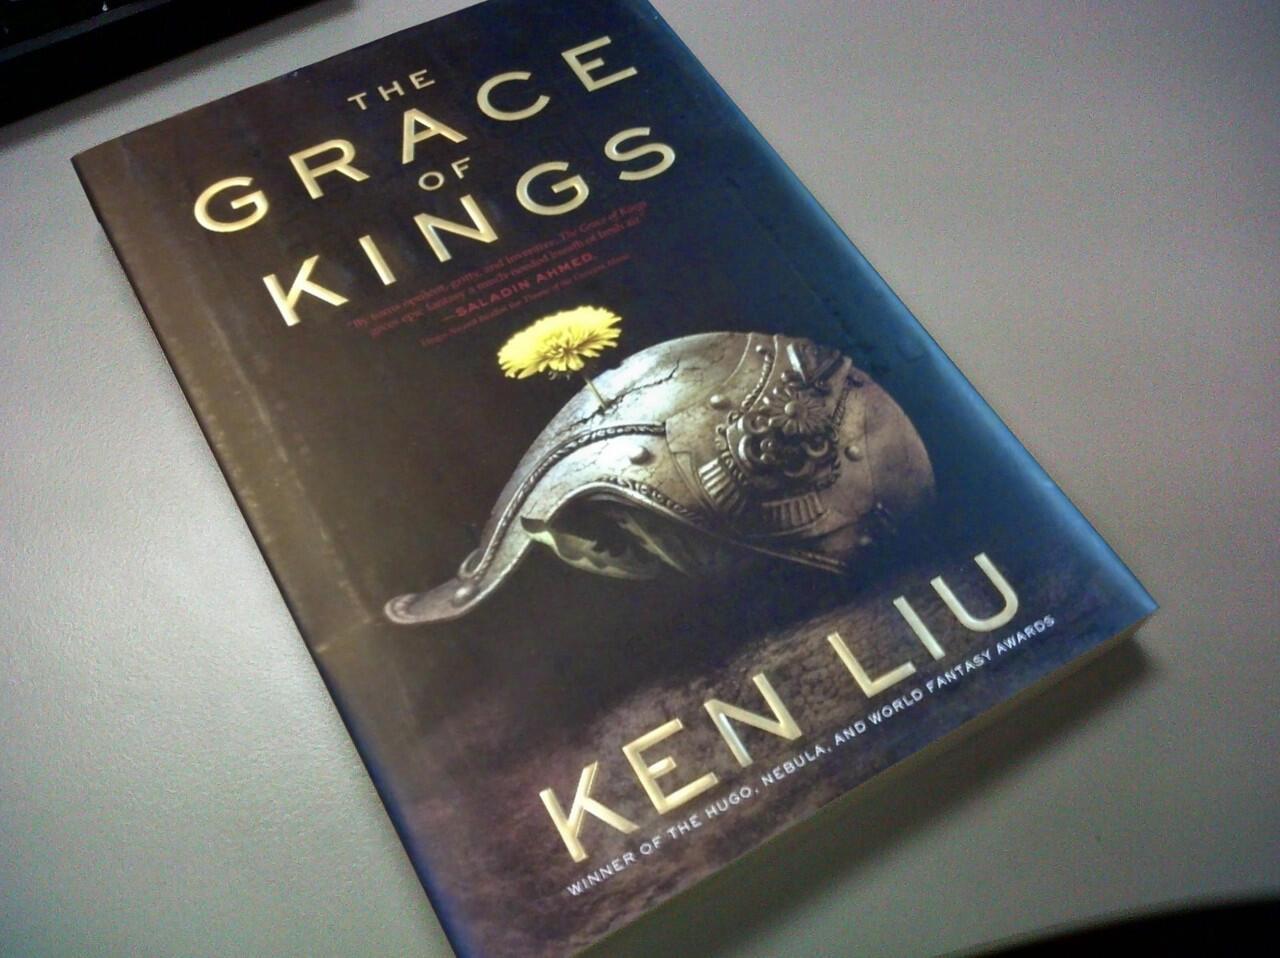 Ulasan Buku: The Grace of Kings